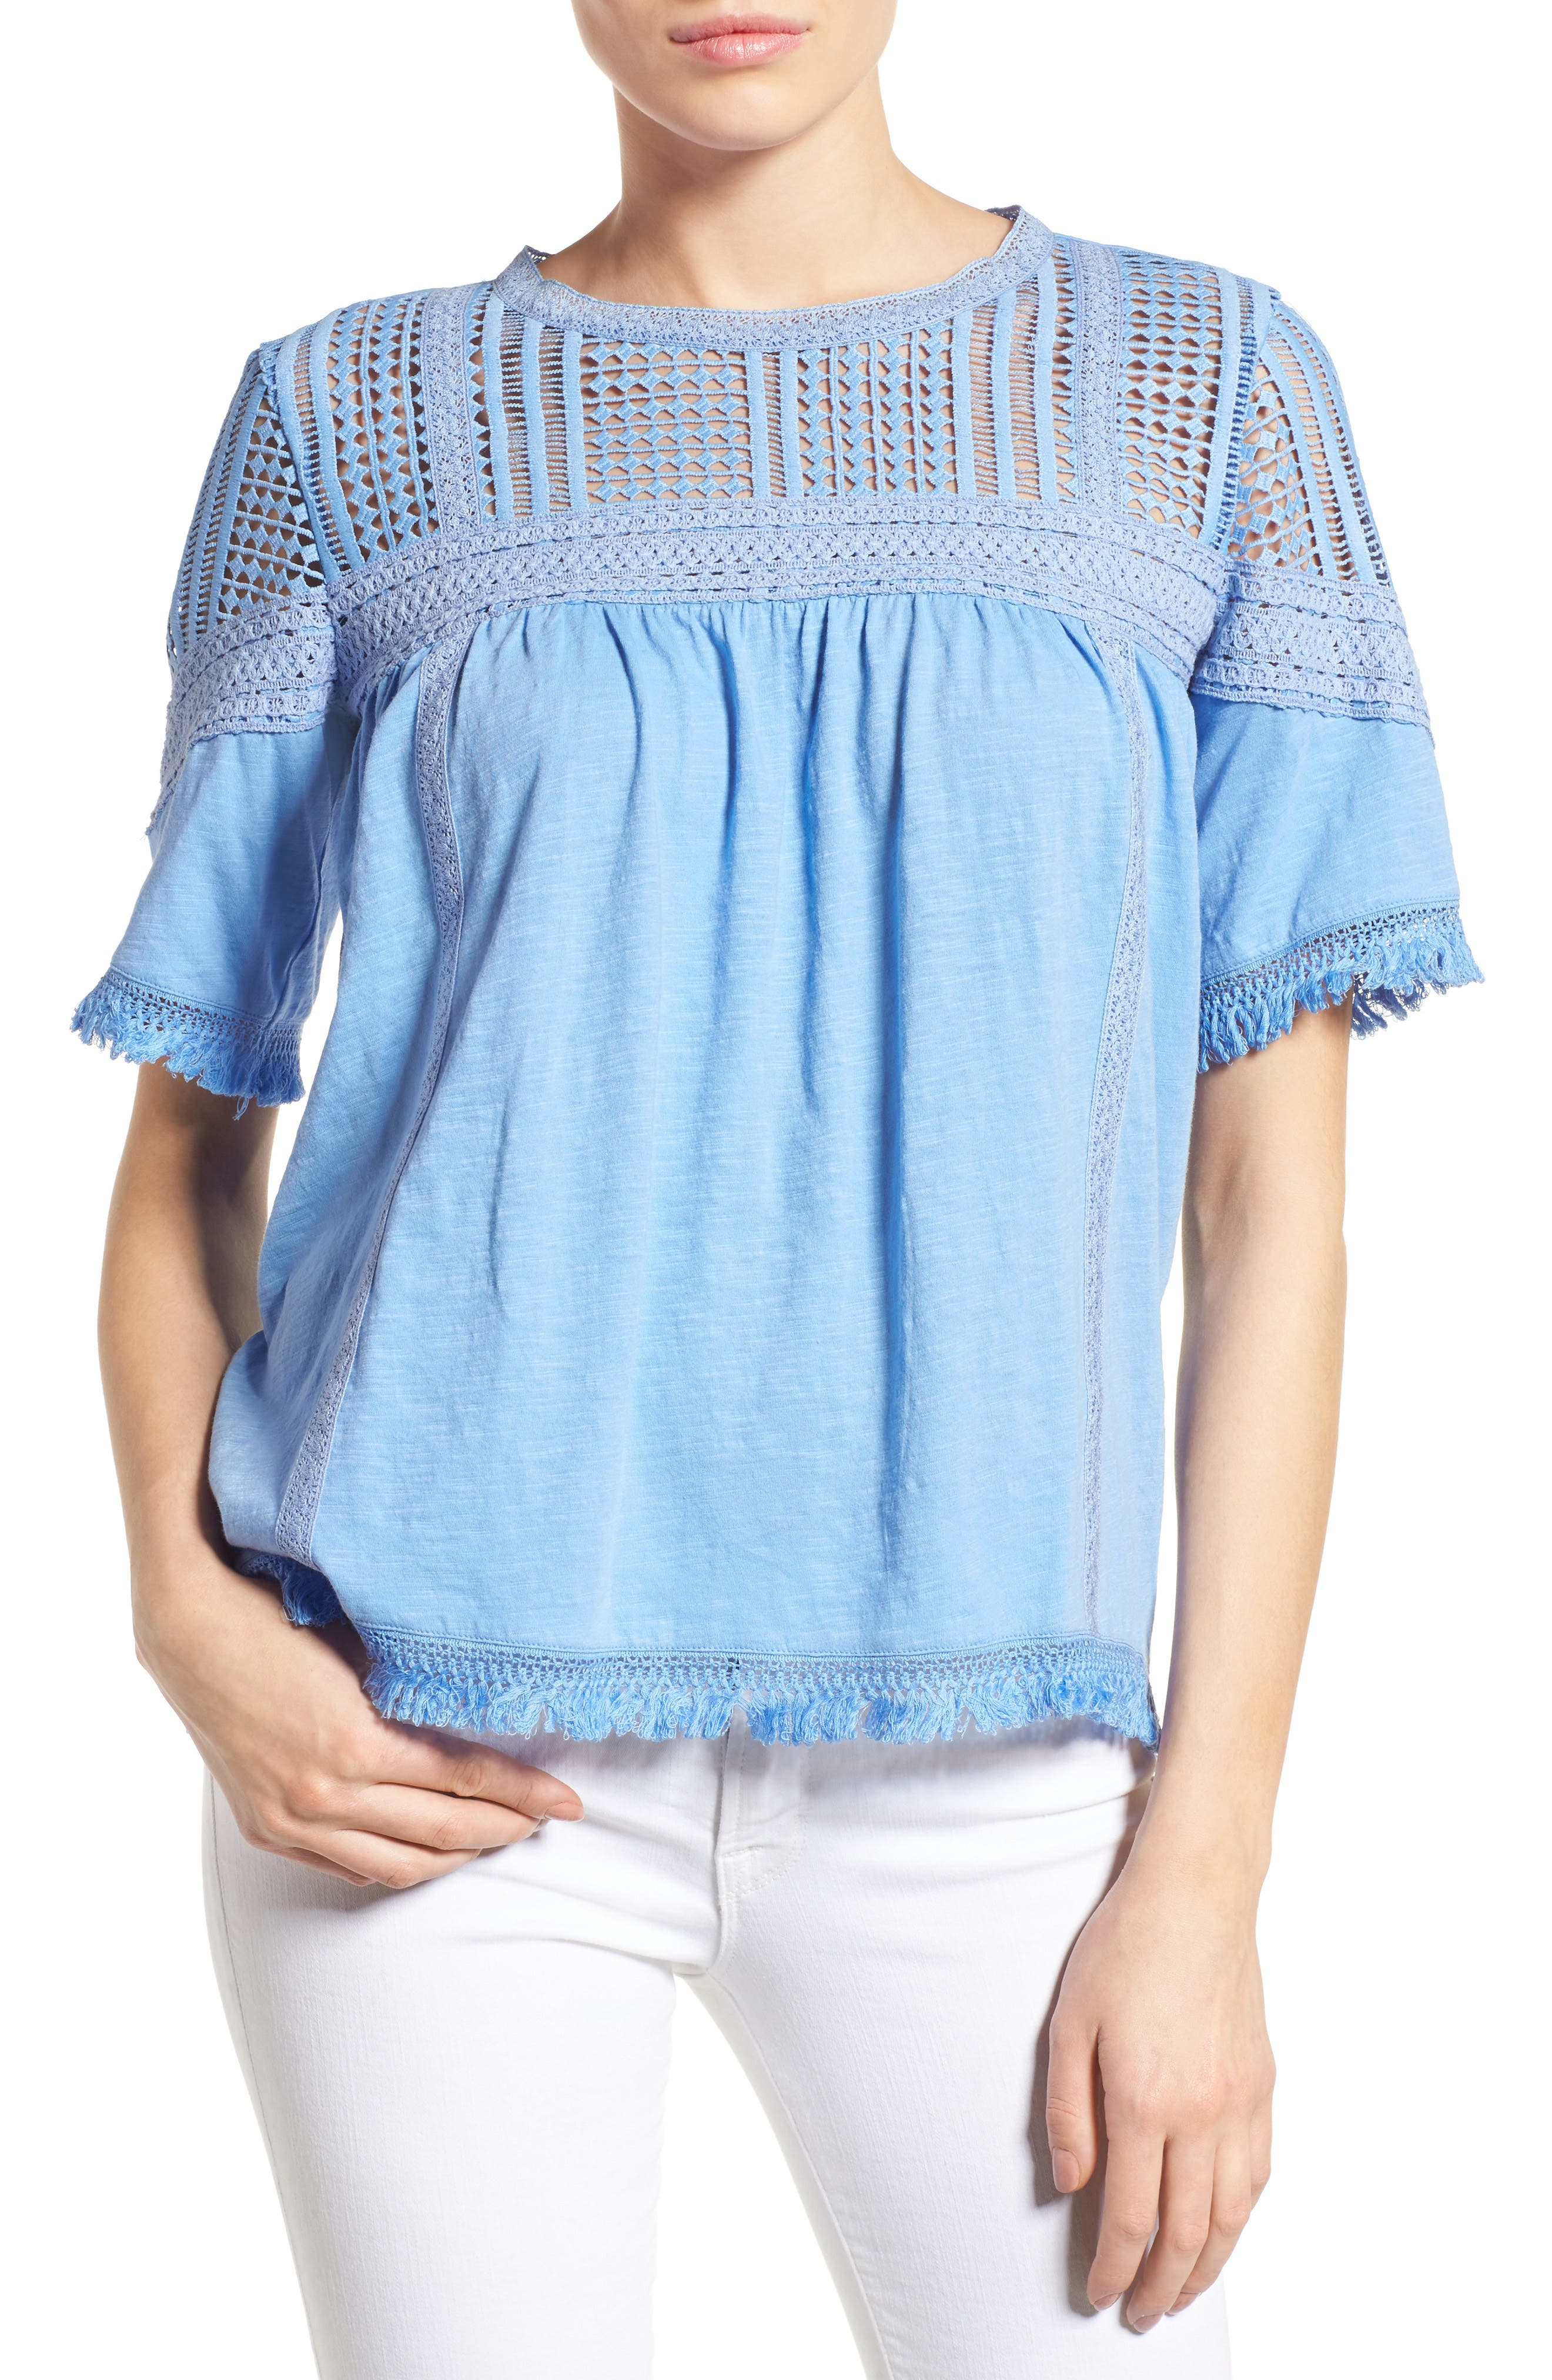 Main Image - Caslon® Fringed Lace & Knit Tee (Regular & Petite)